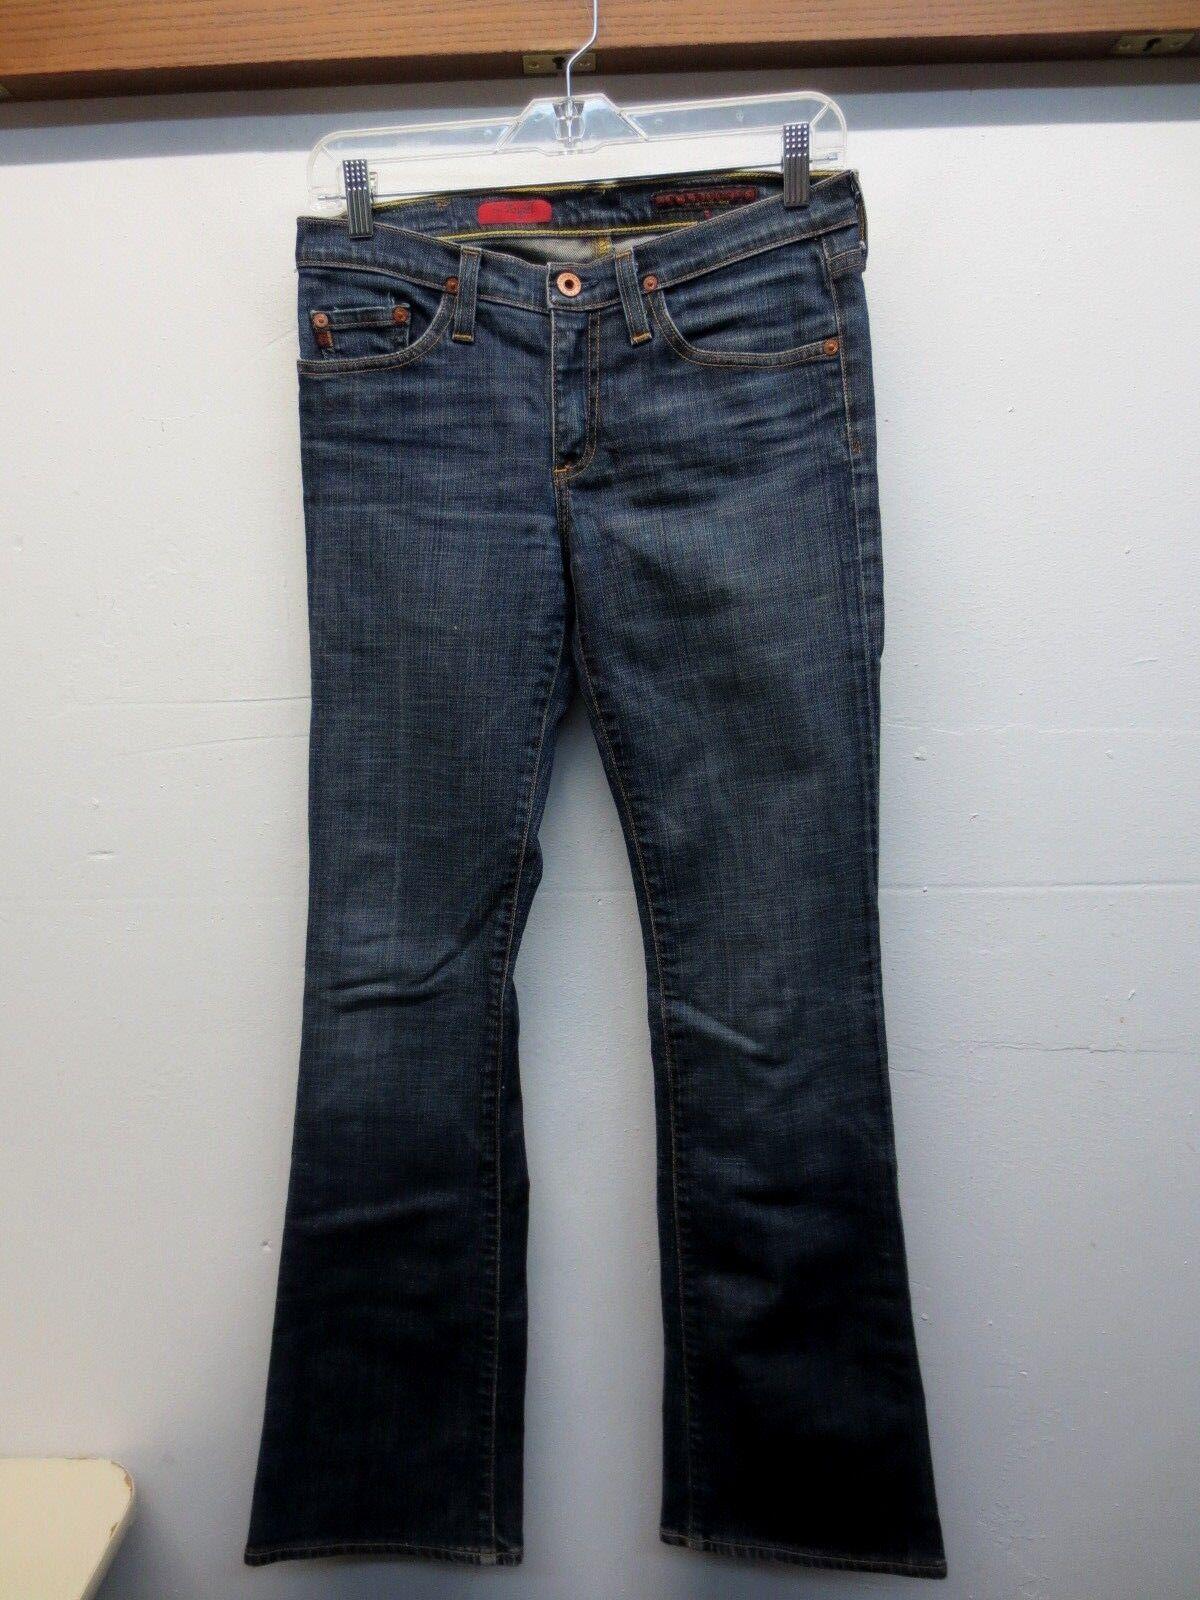 Adriano goldschmied (AG) The Angel size 28 women's bluee jeans